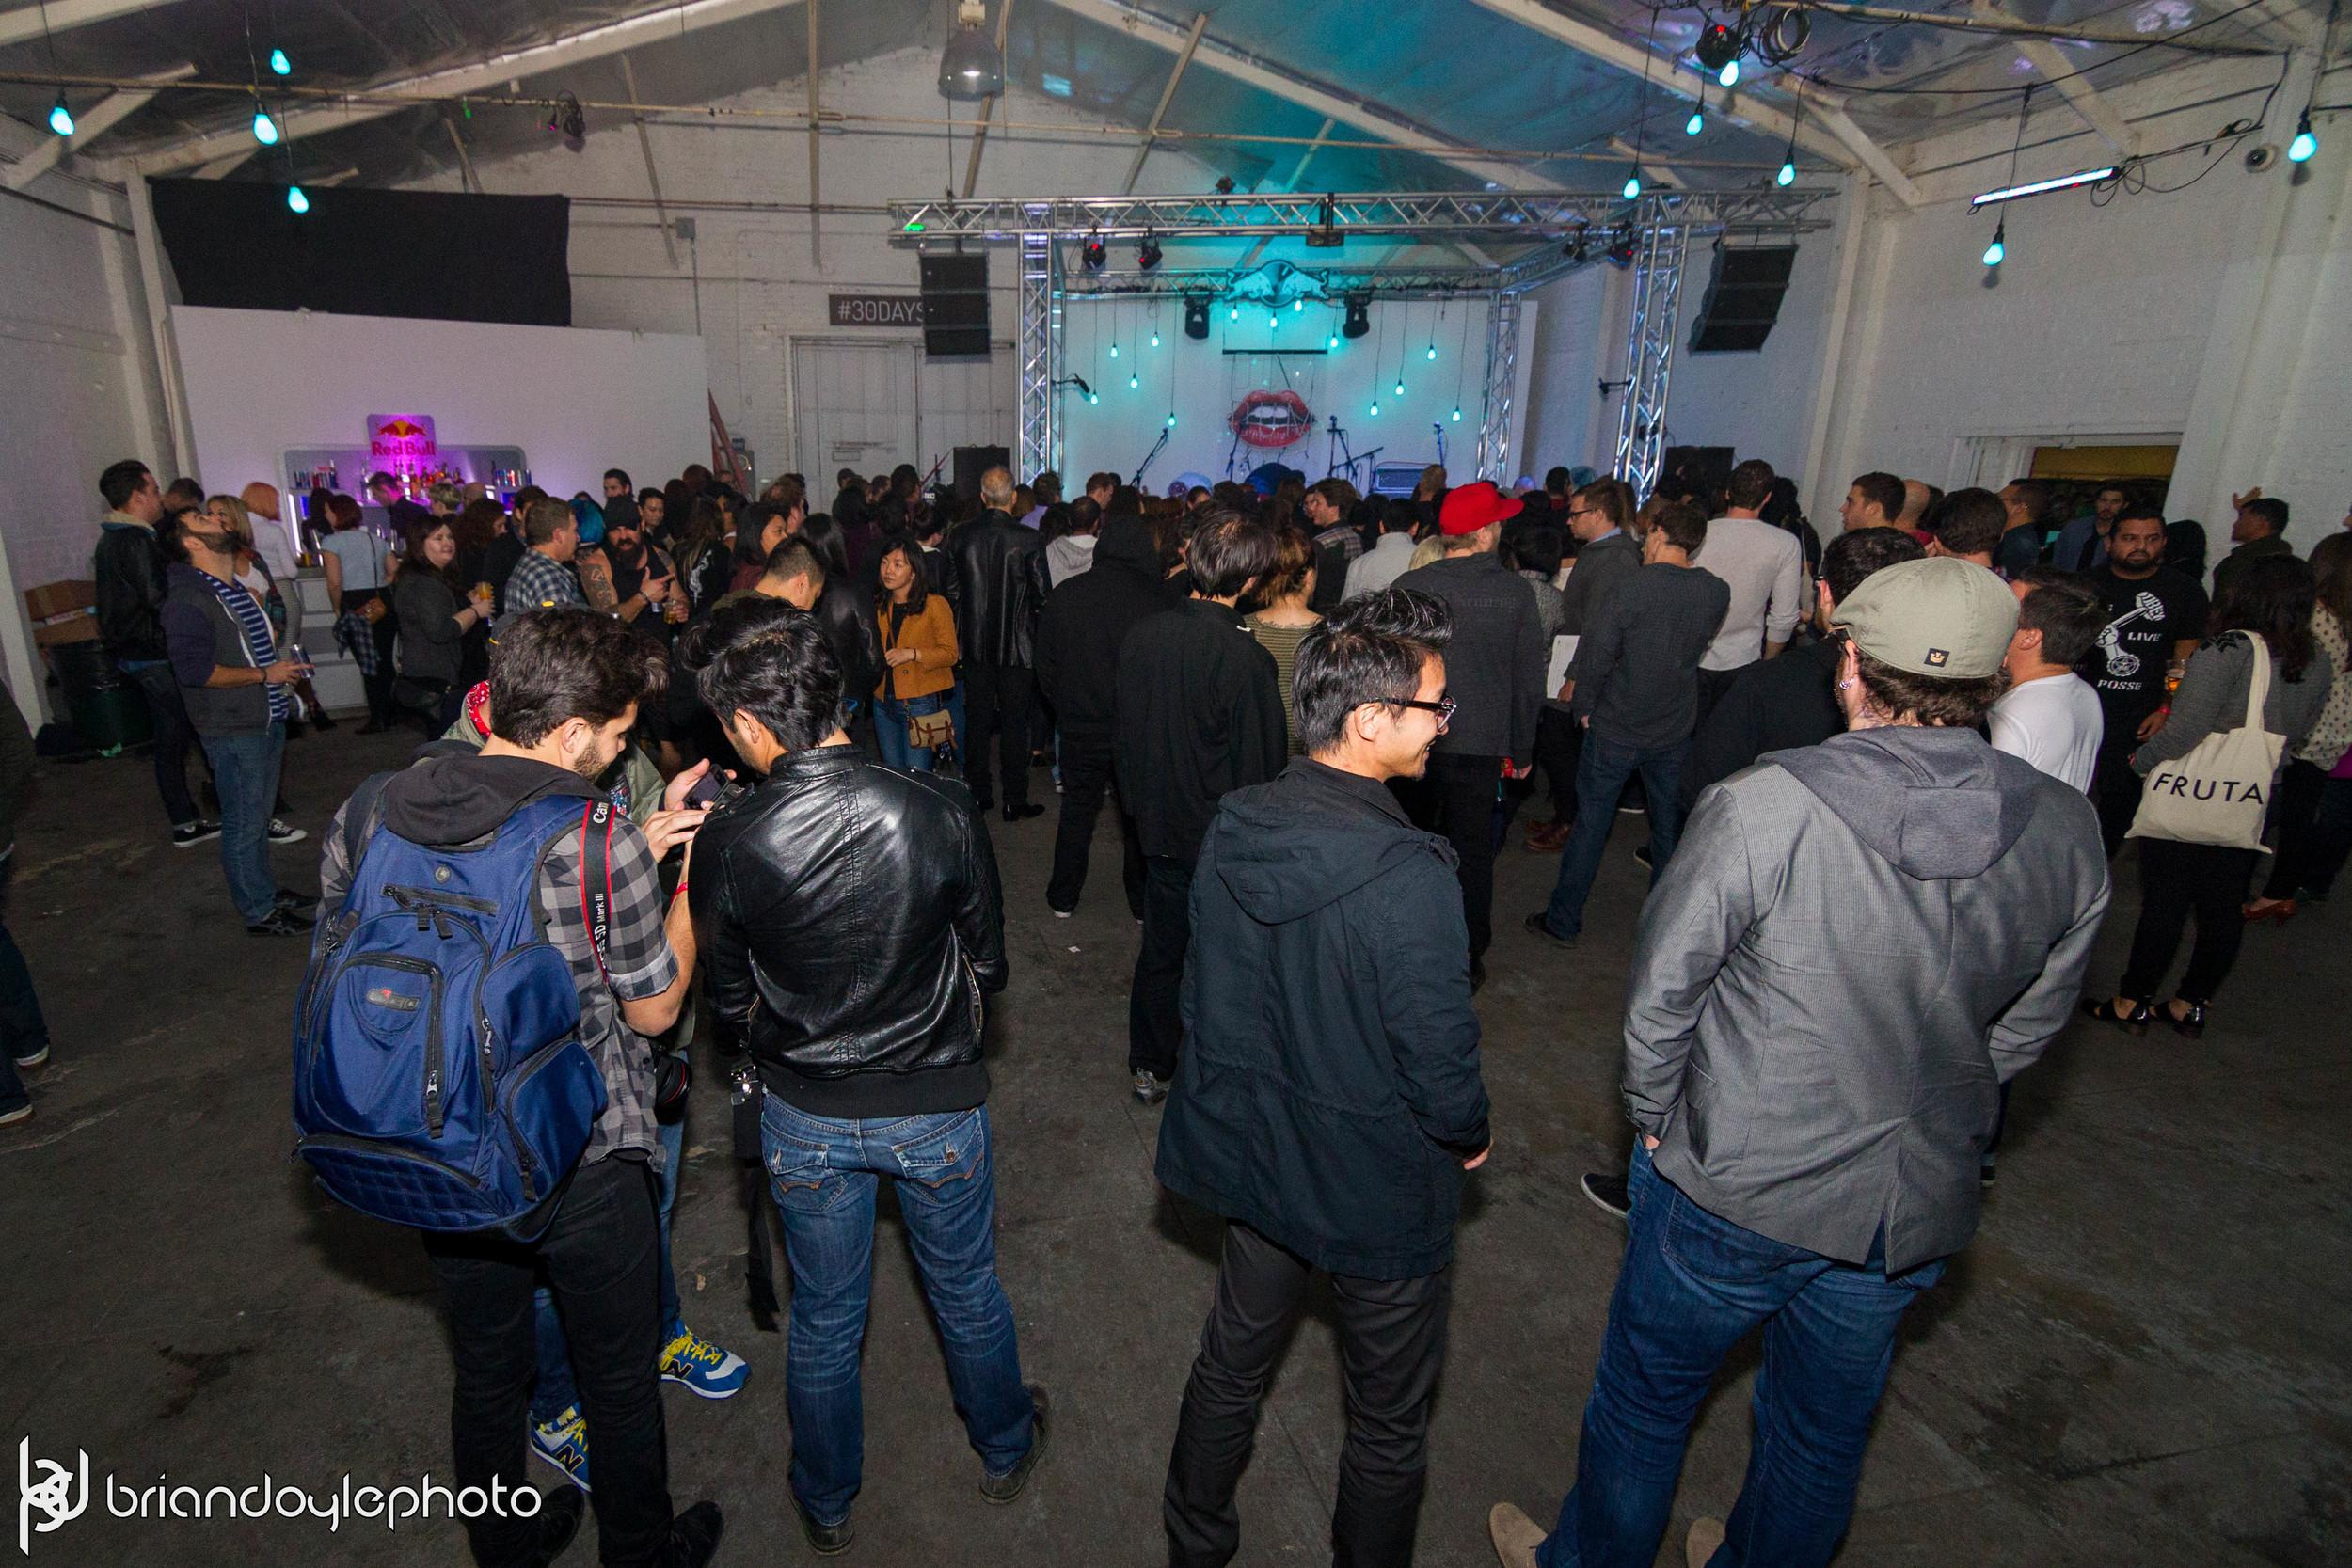 Red Bull - Dum Dum Girls, Tropicana and the Flea, Lowell @ The Well 2014.11.16-38.jpg